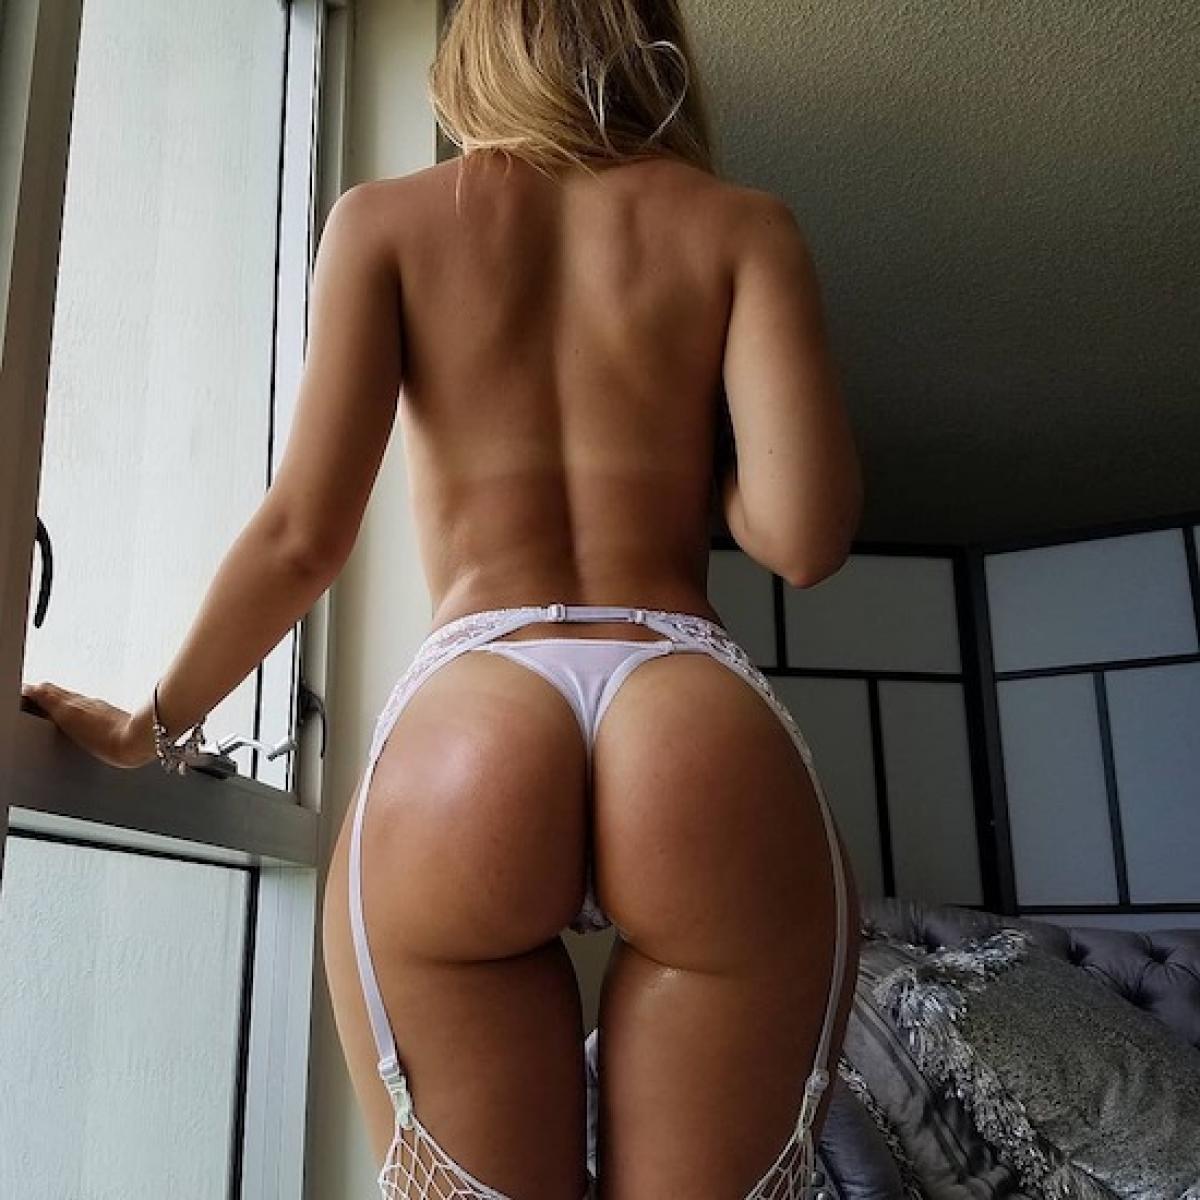 Huge bbw ass in string thong